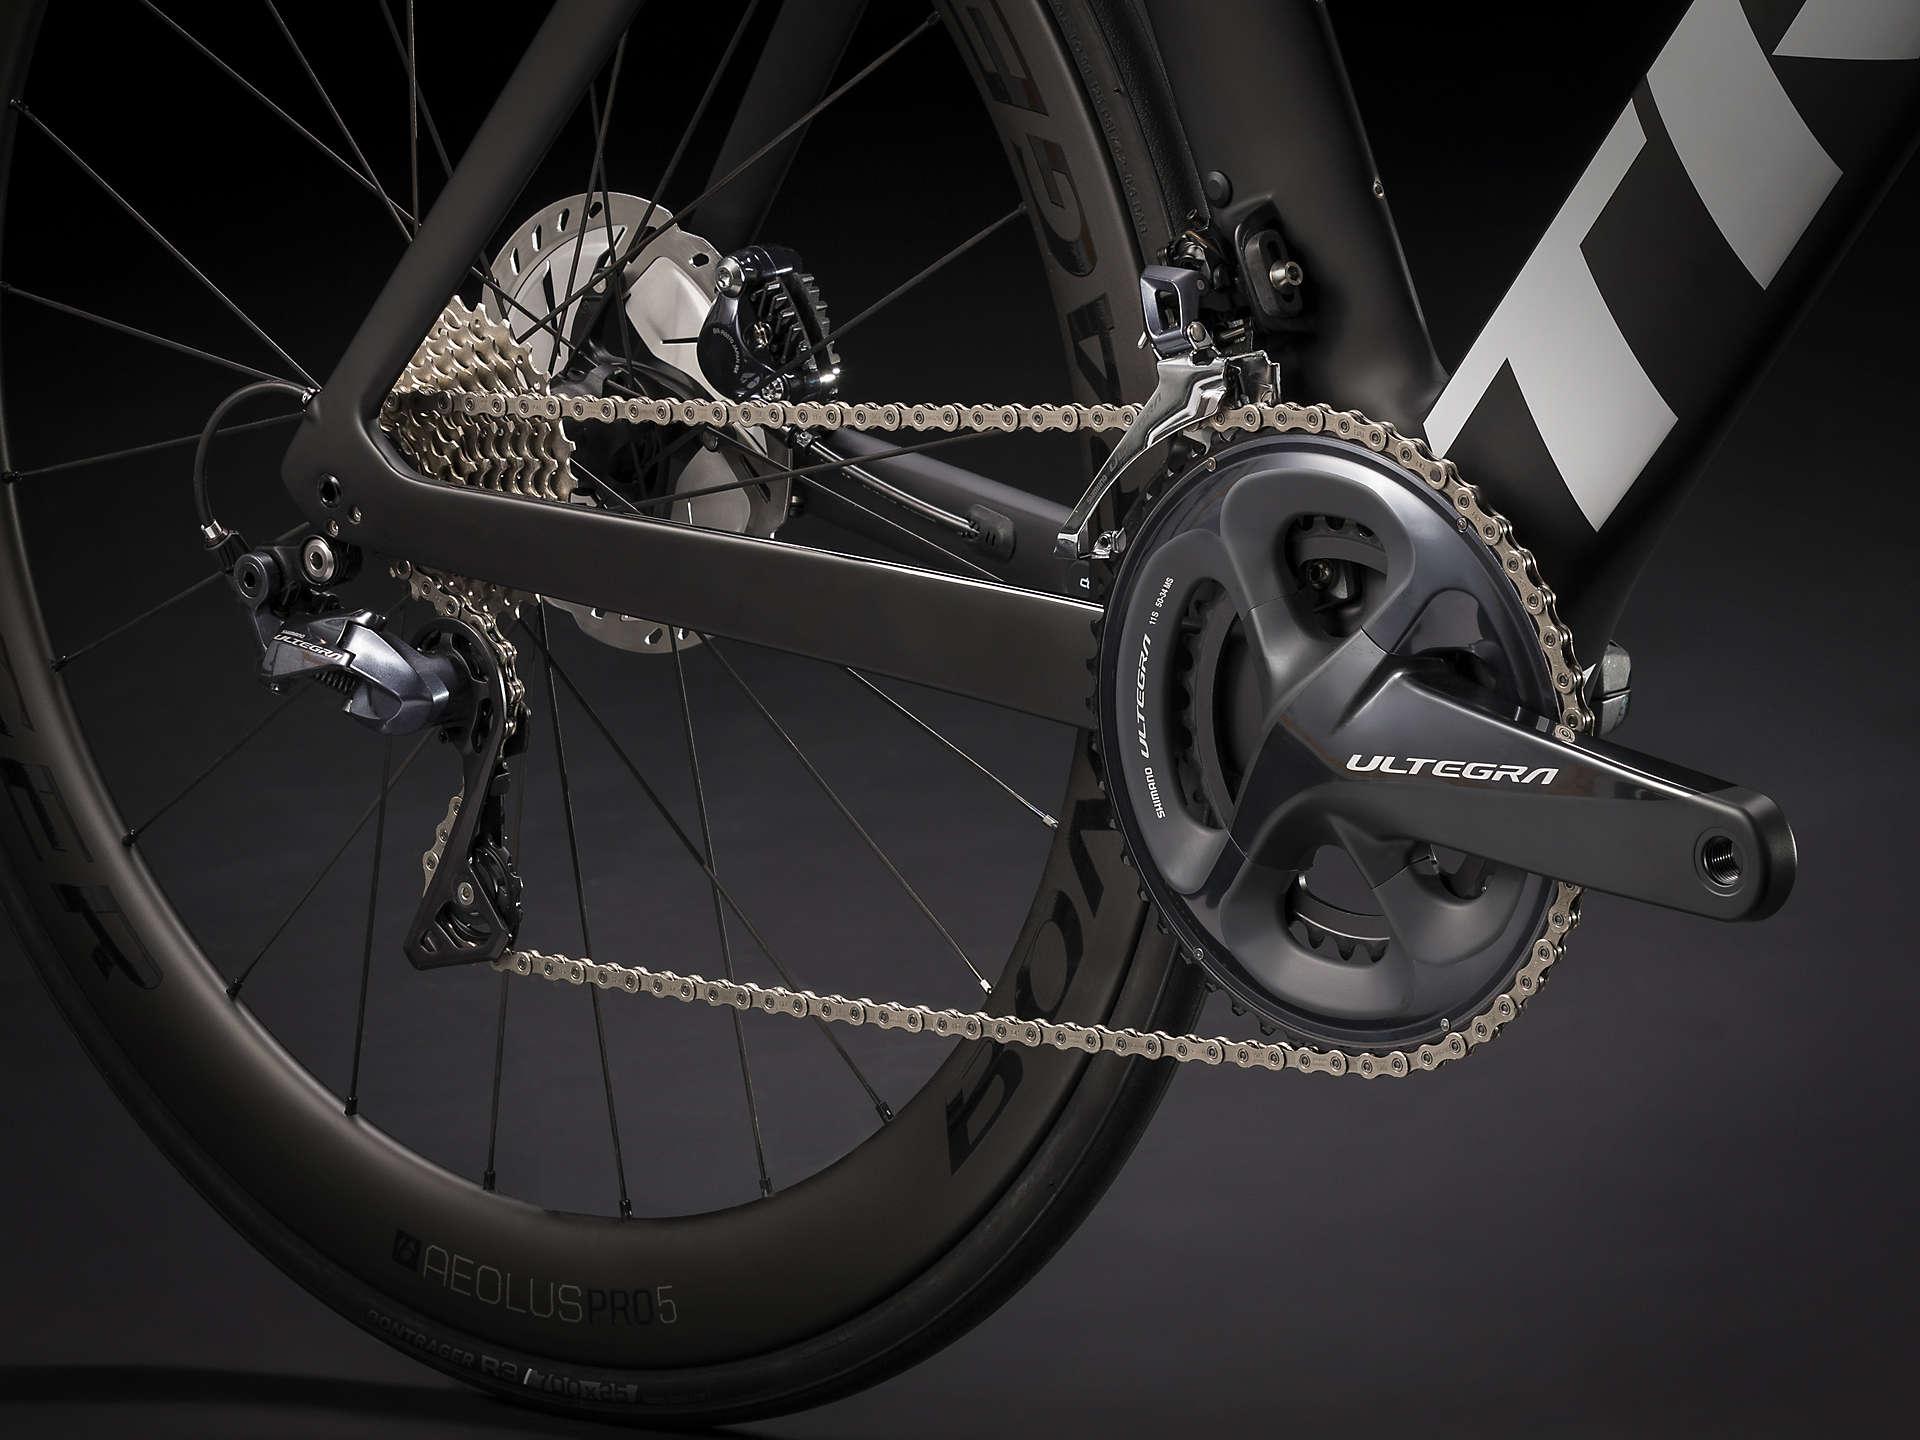 Bicicleta Trek Madone Speed Disco - Tamanho 56 - 2020